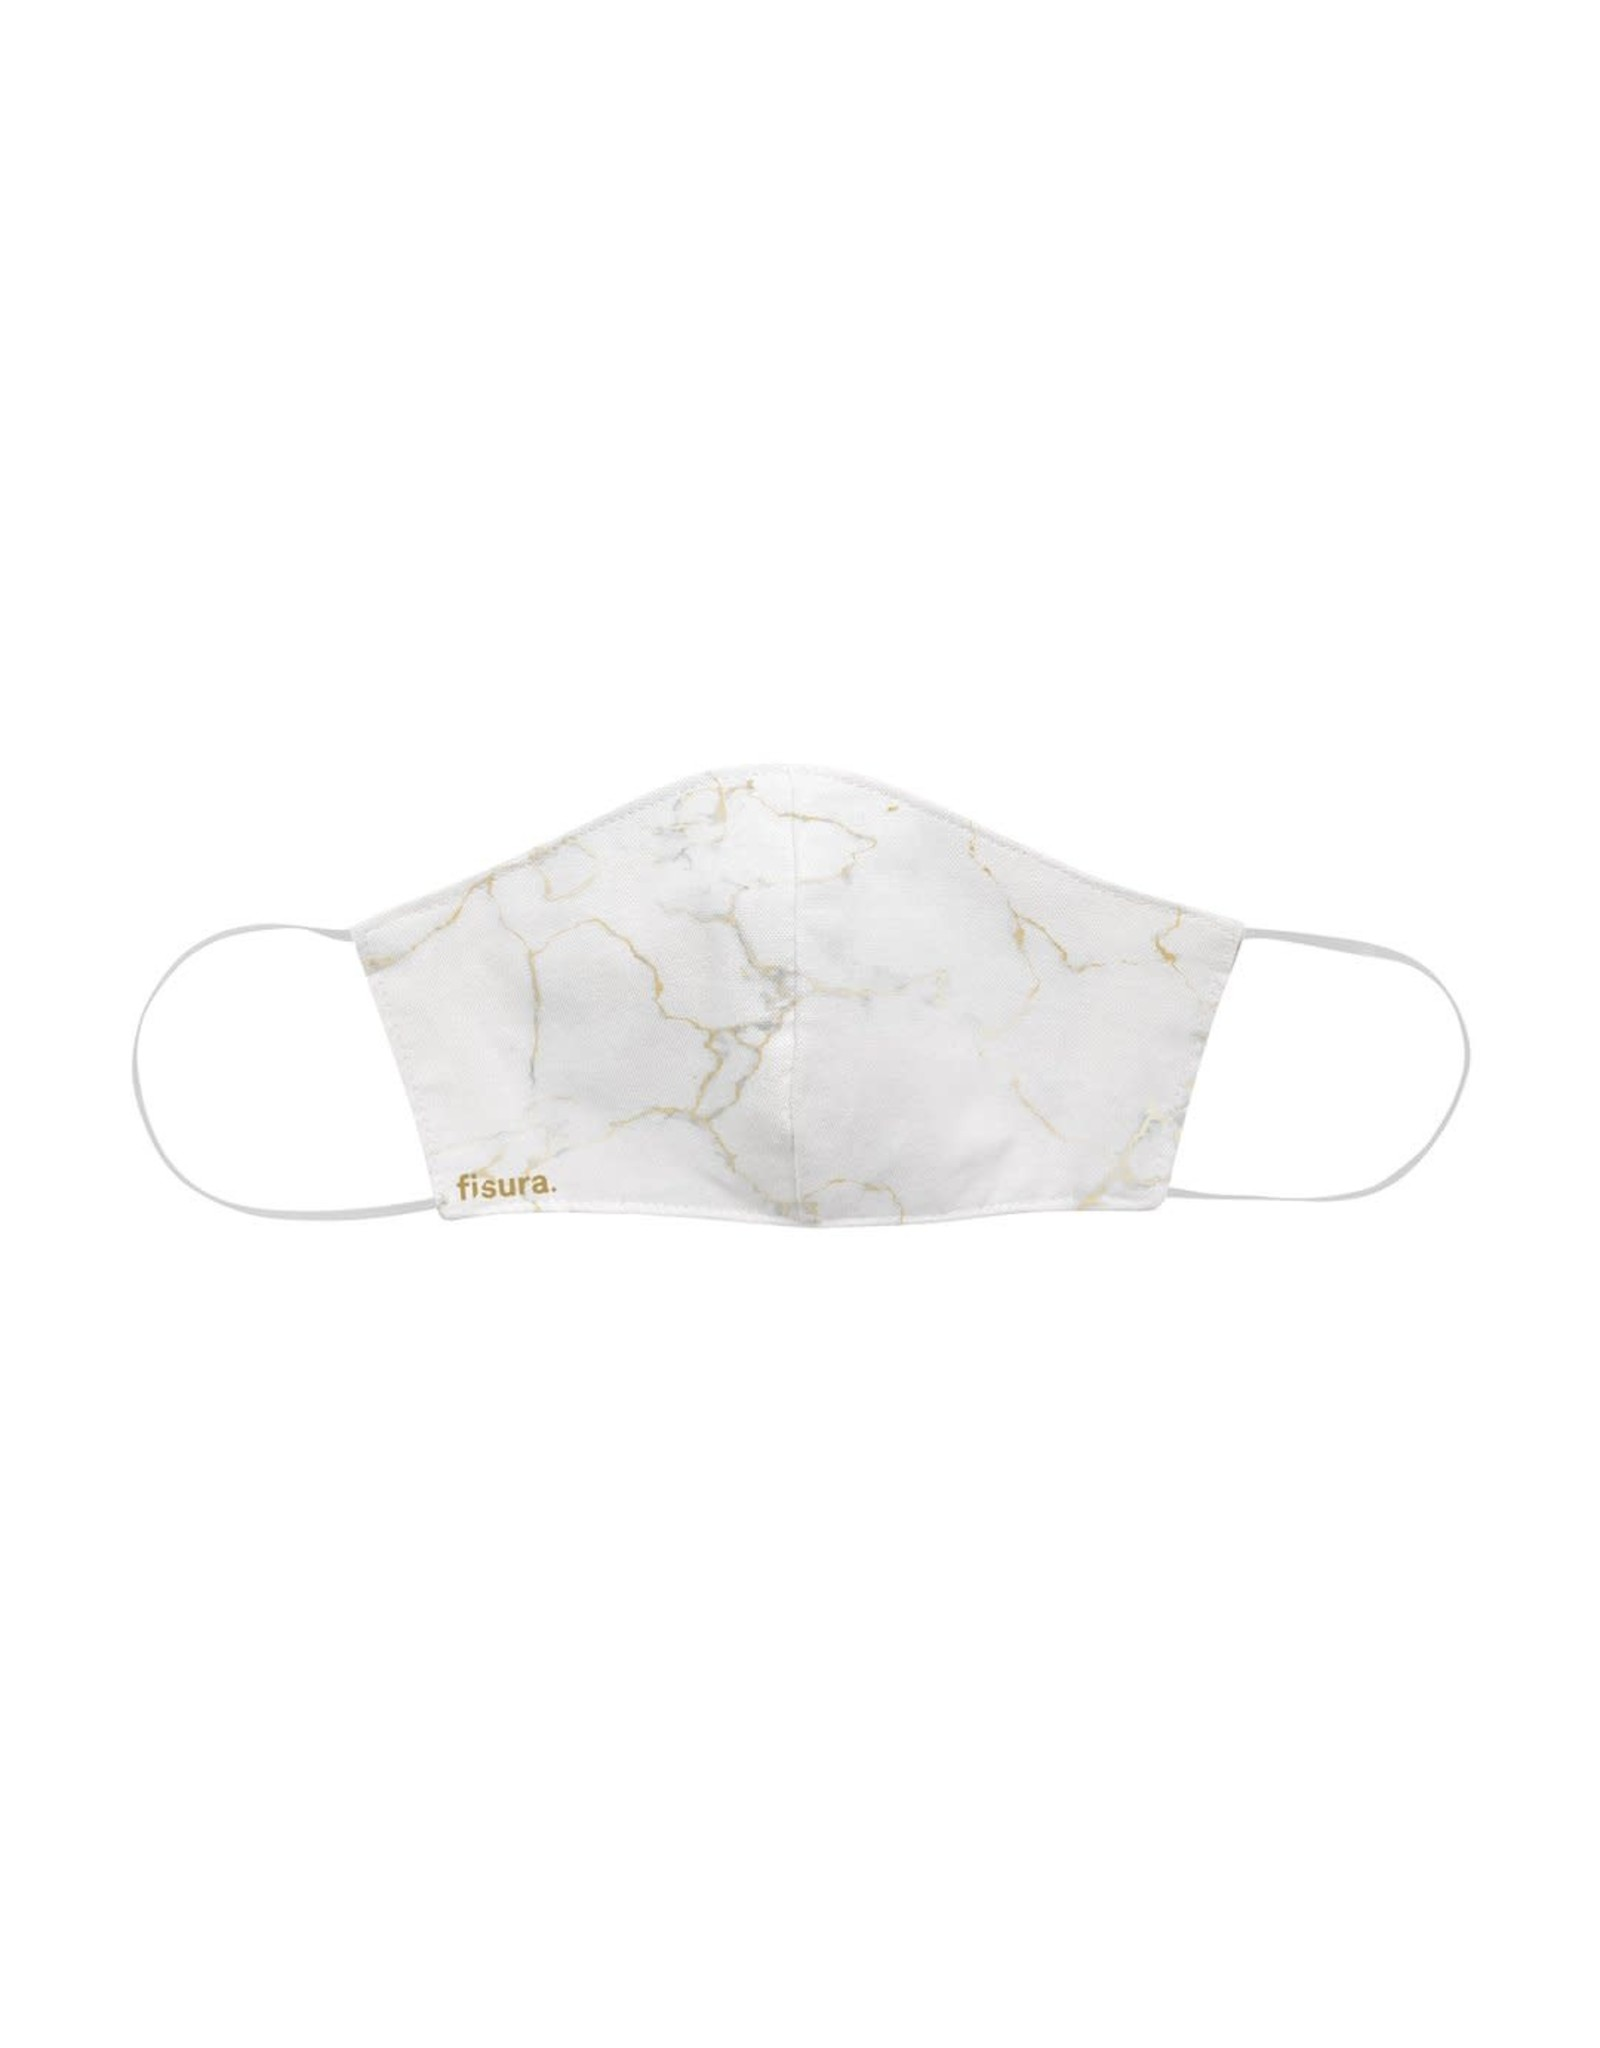 Fisura Mondmasker - Marble White